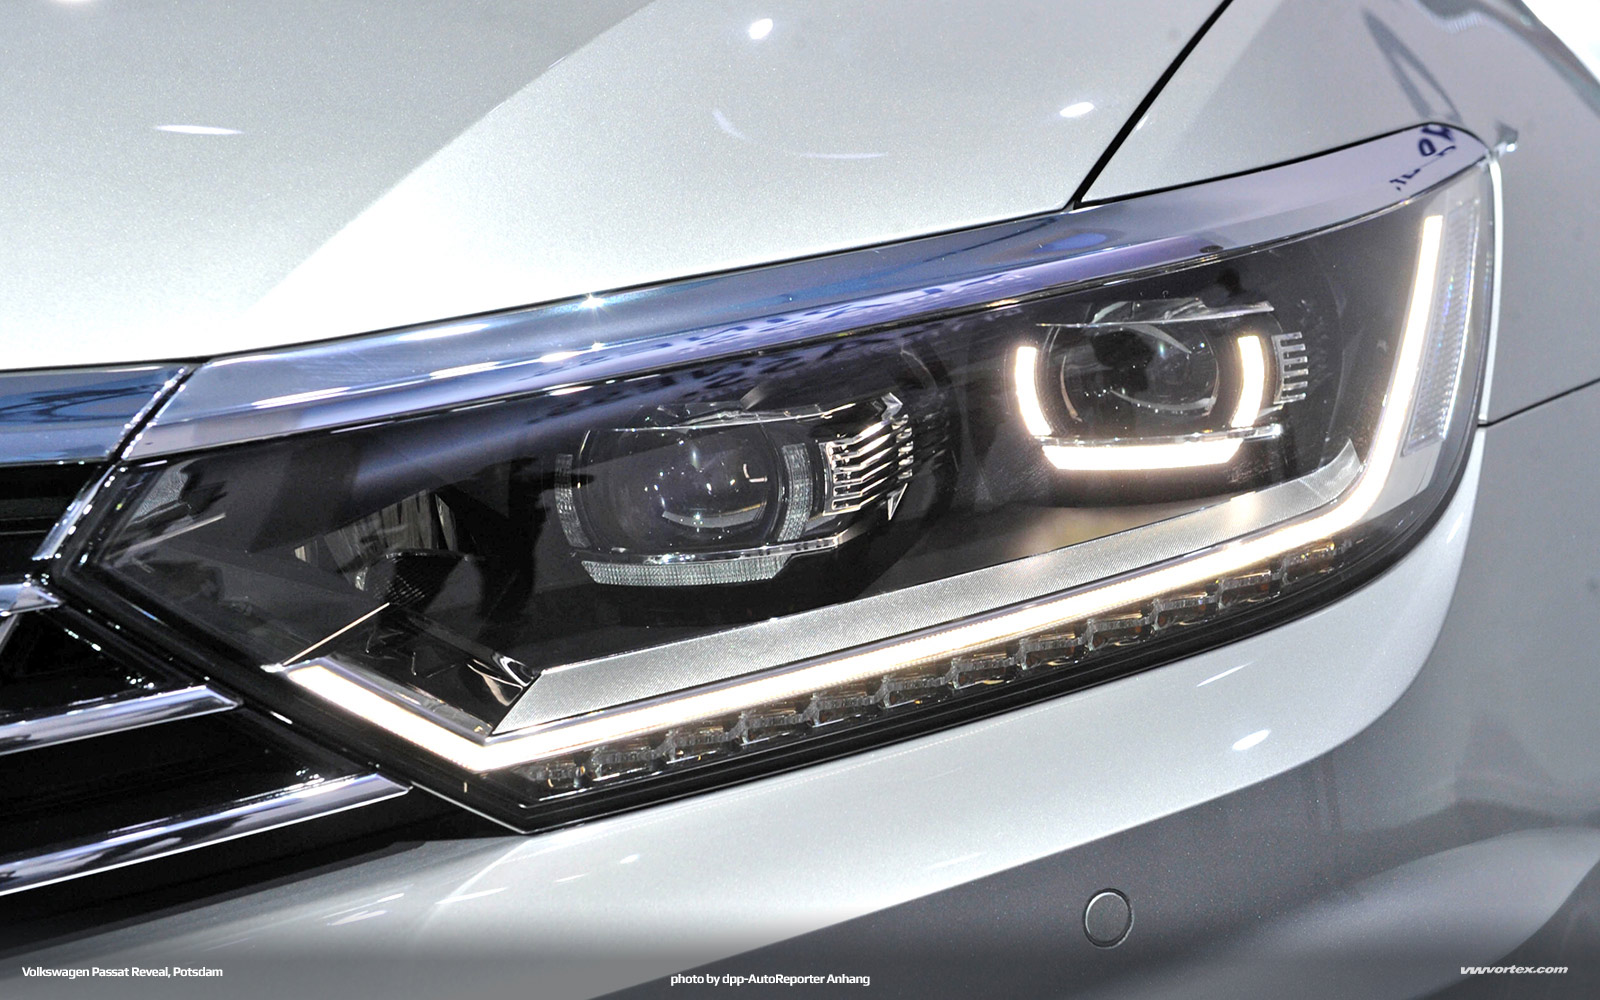 2014 Volkswagen Passat VIII MQB Reveal Potsdam 654 960x480